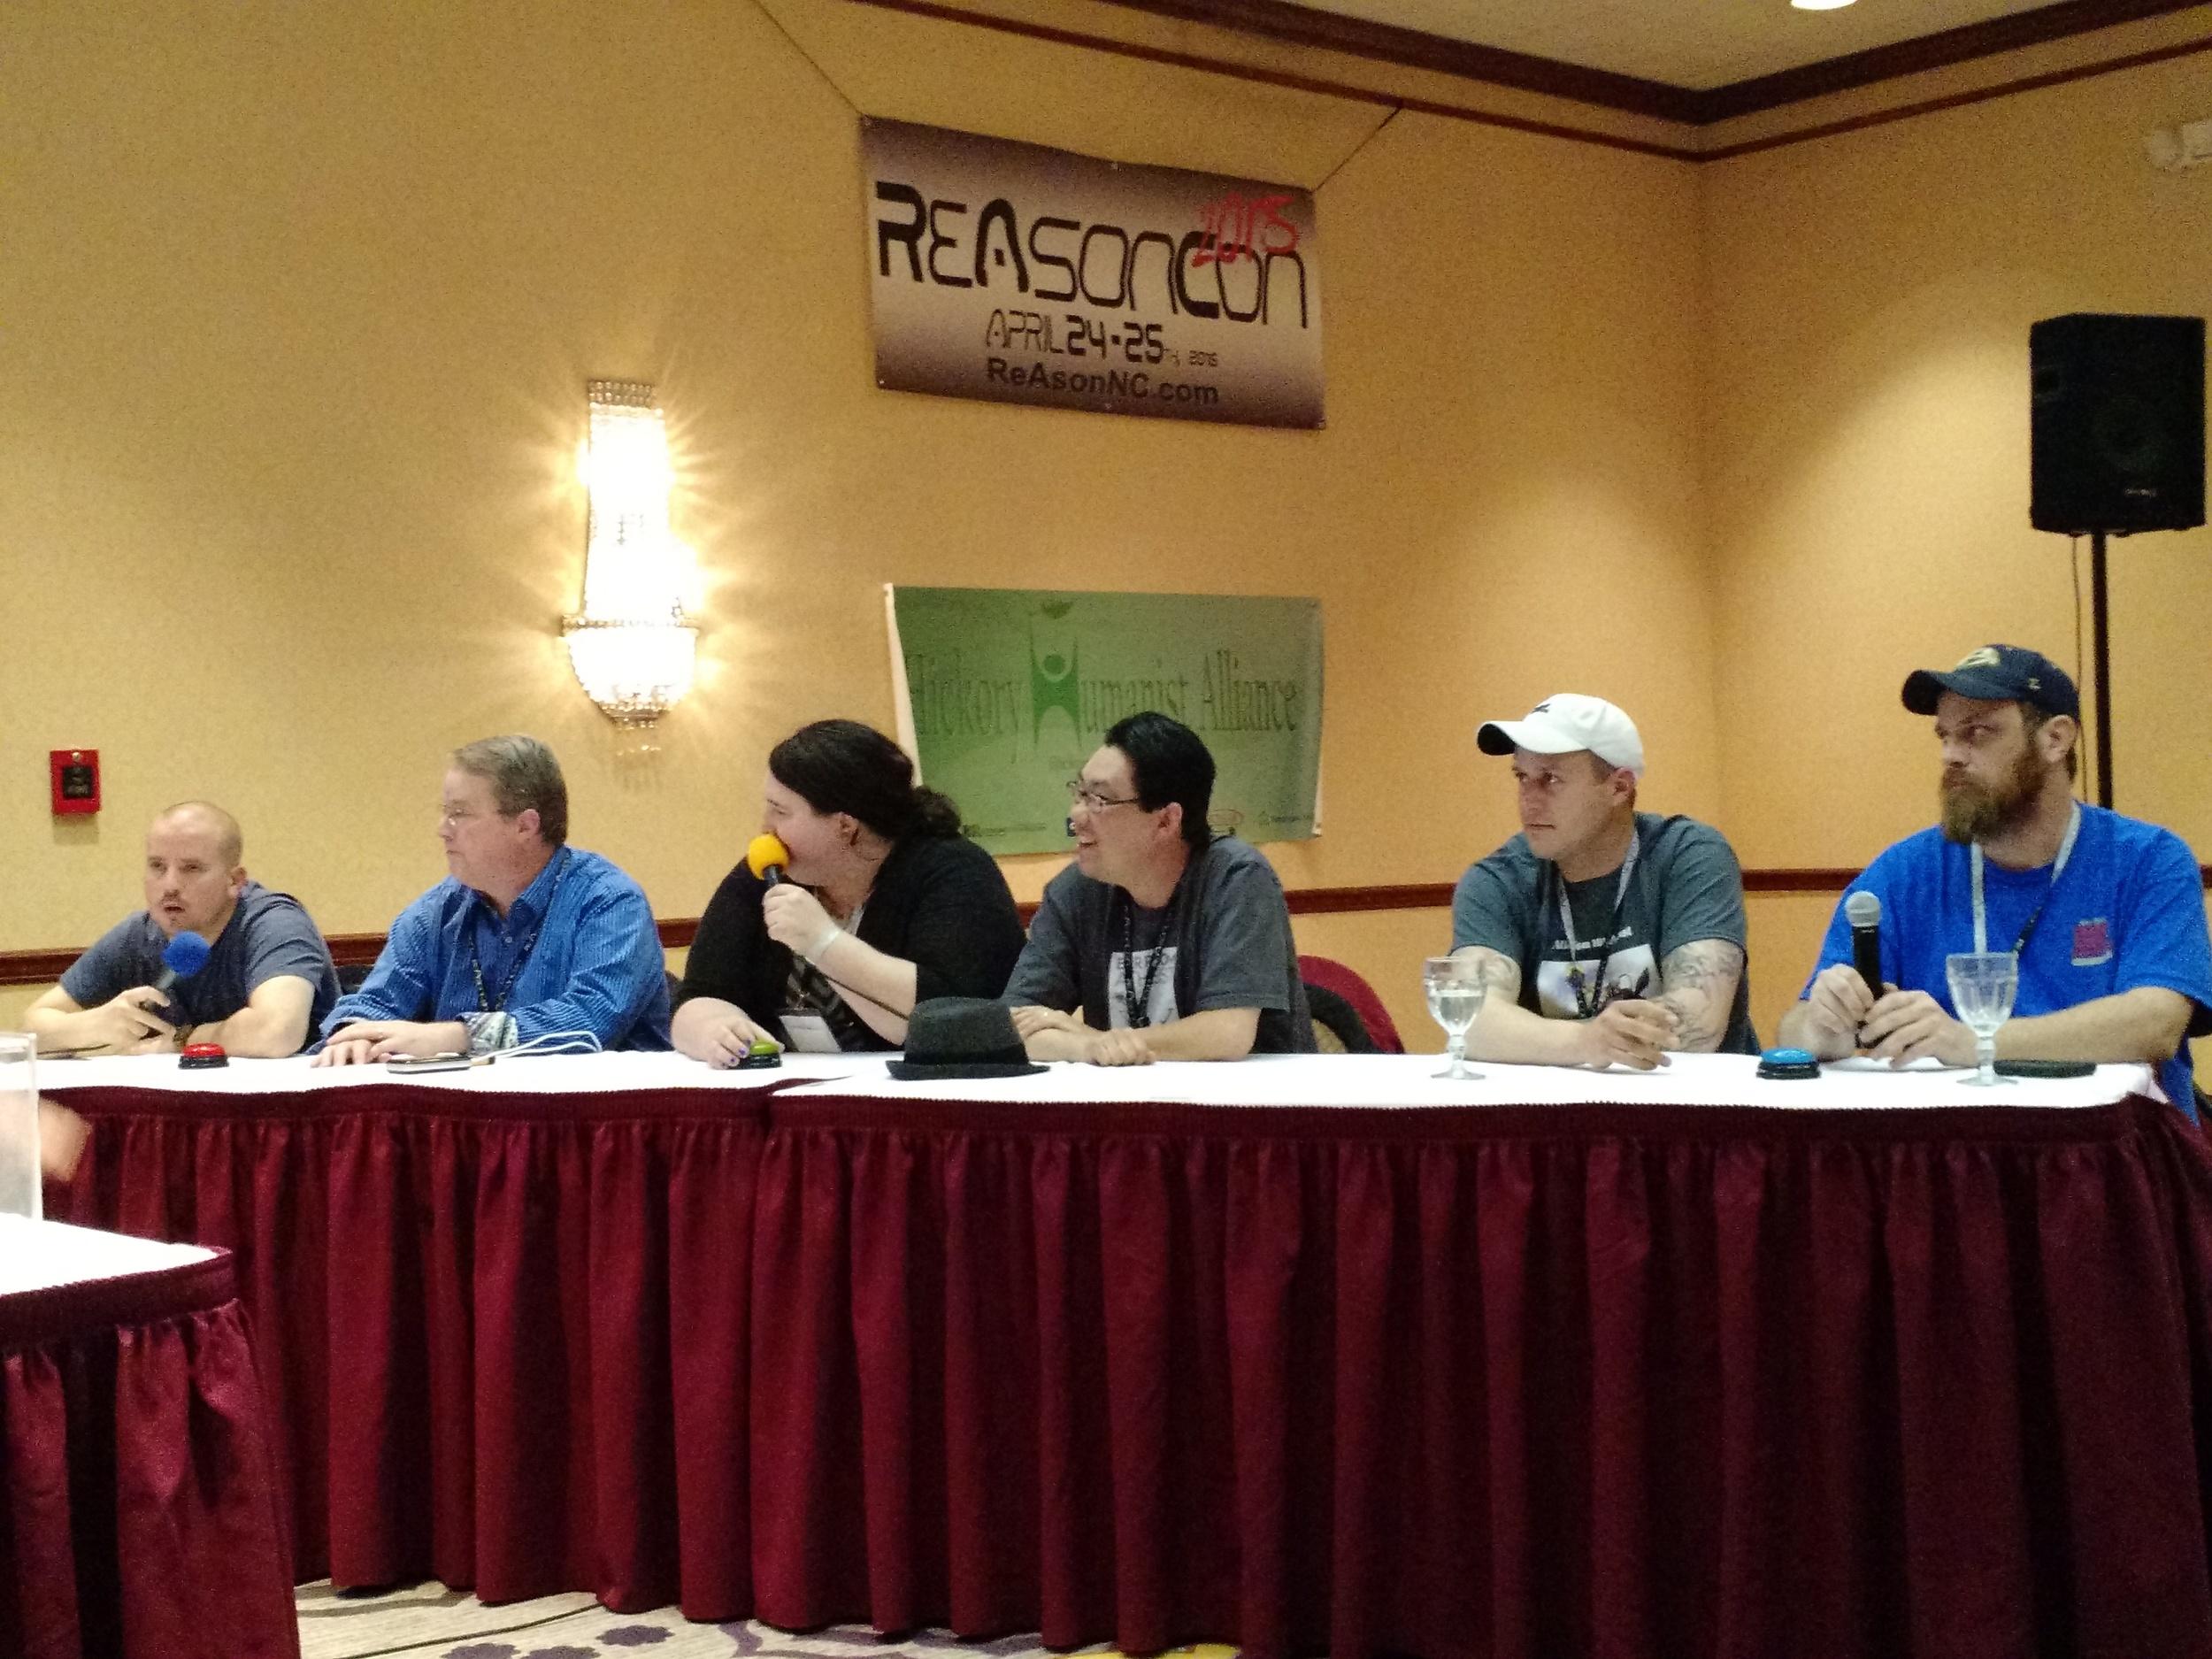 Left to Right: David Smalley  @ davidcsmalley  , Phil Ferguson  @ skepticmoney  , Callie Wright  @ gaytheistcallie  , Andrew Garber, Matt  atheism101podcast.com ,Chris @ SeethinHeathen